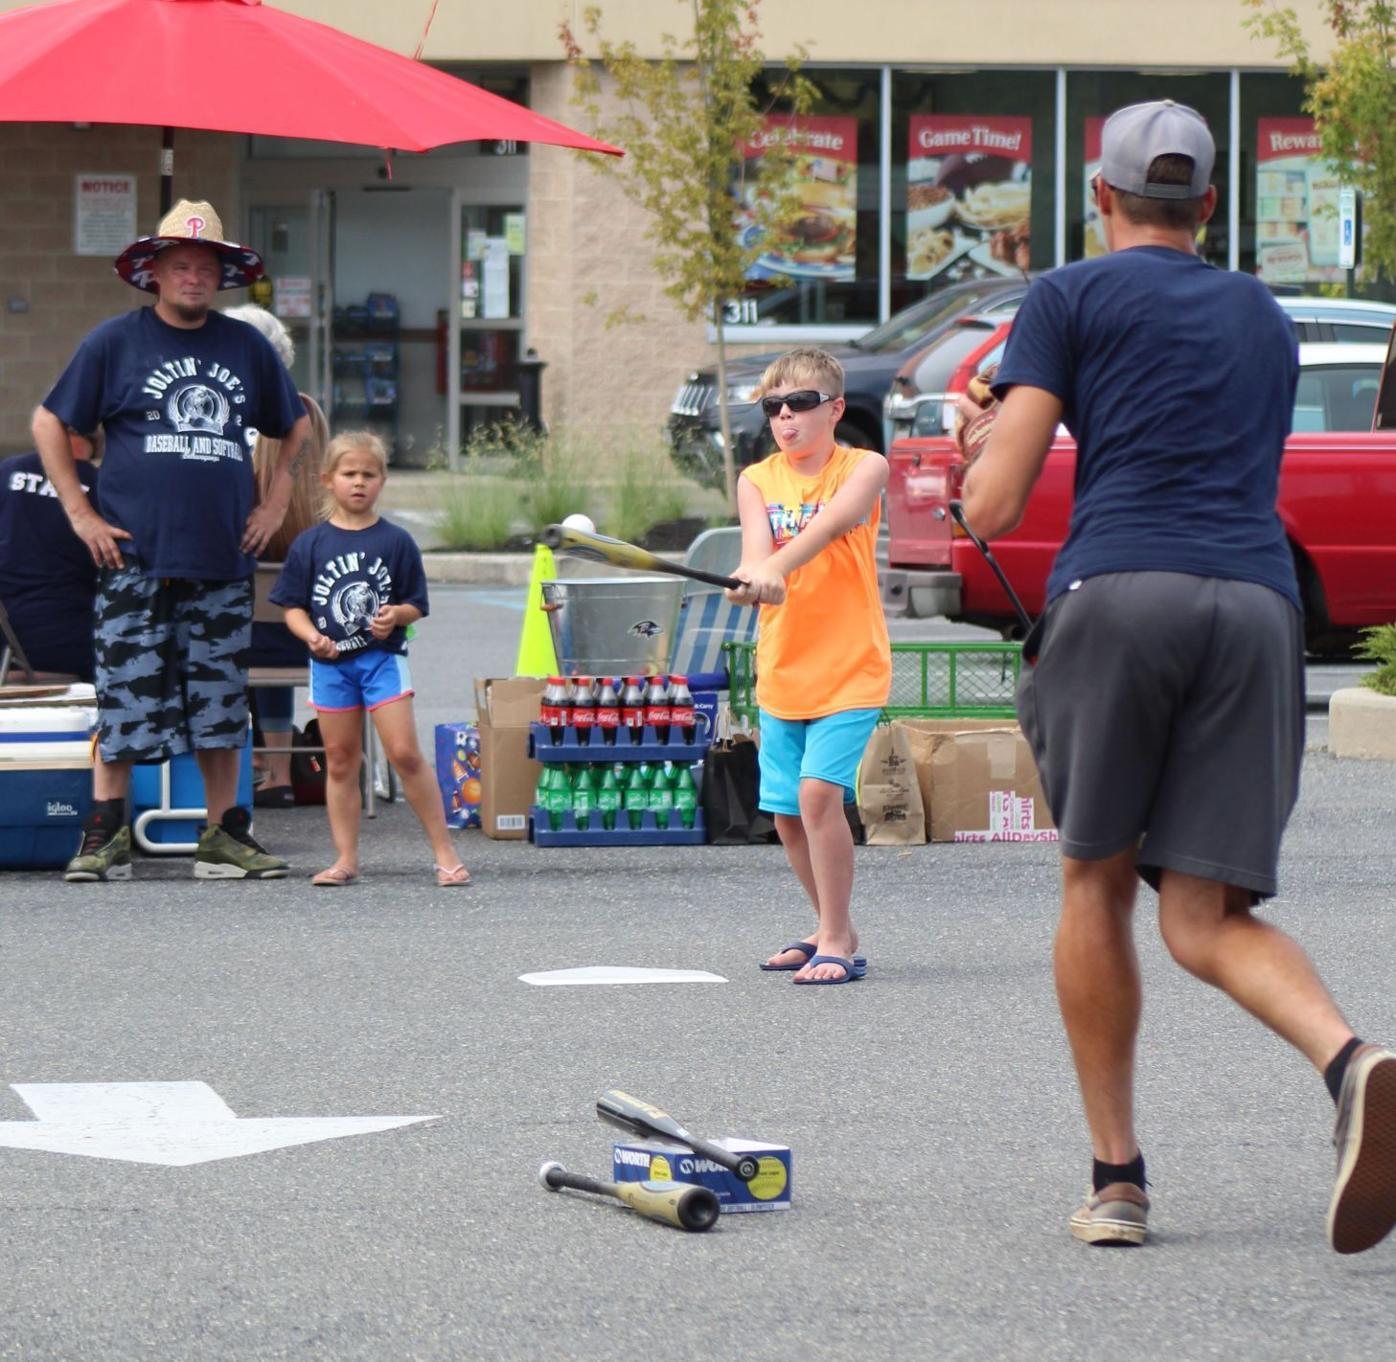 Joltin' Joe offers a baseball clinic for local kids